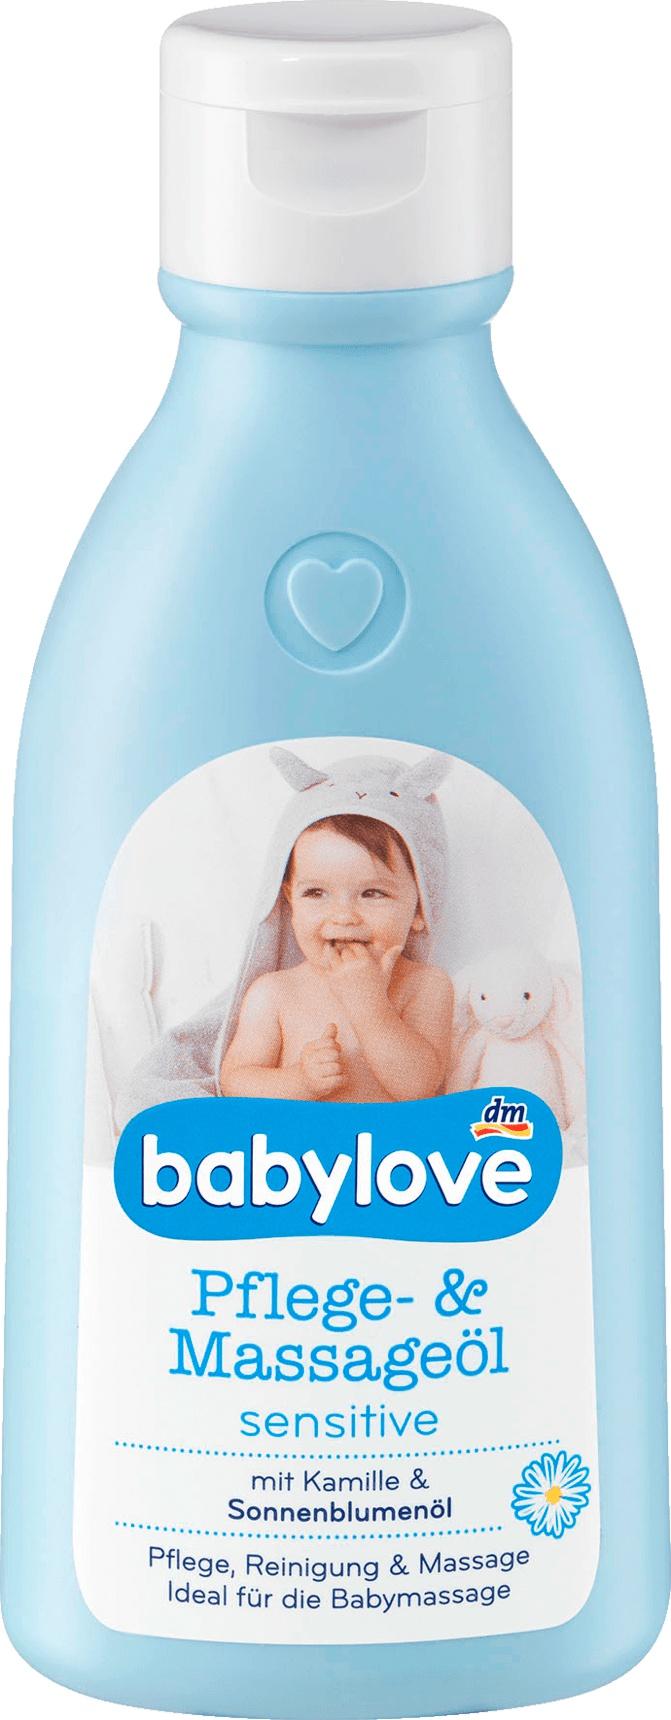 Babylove babylove Pflege- u. Massageöl sensitive